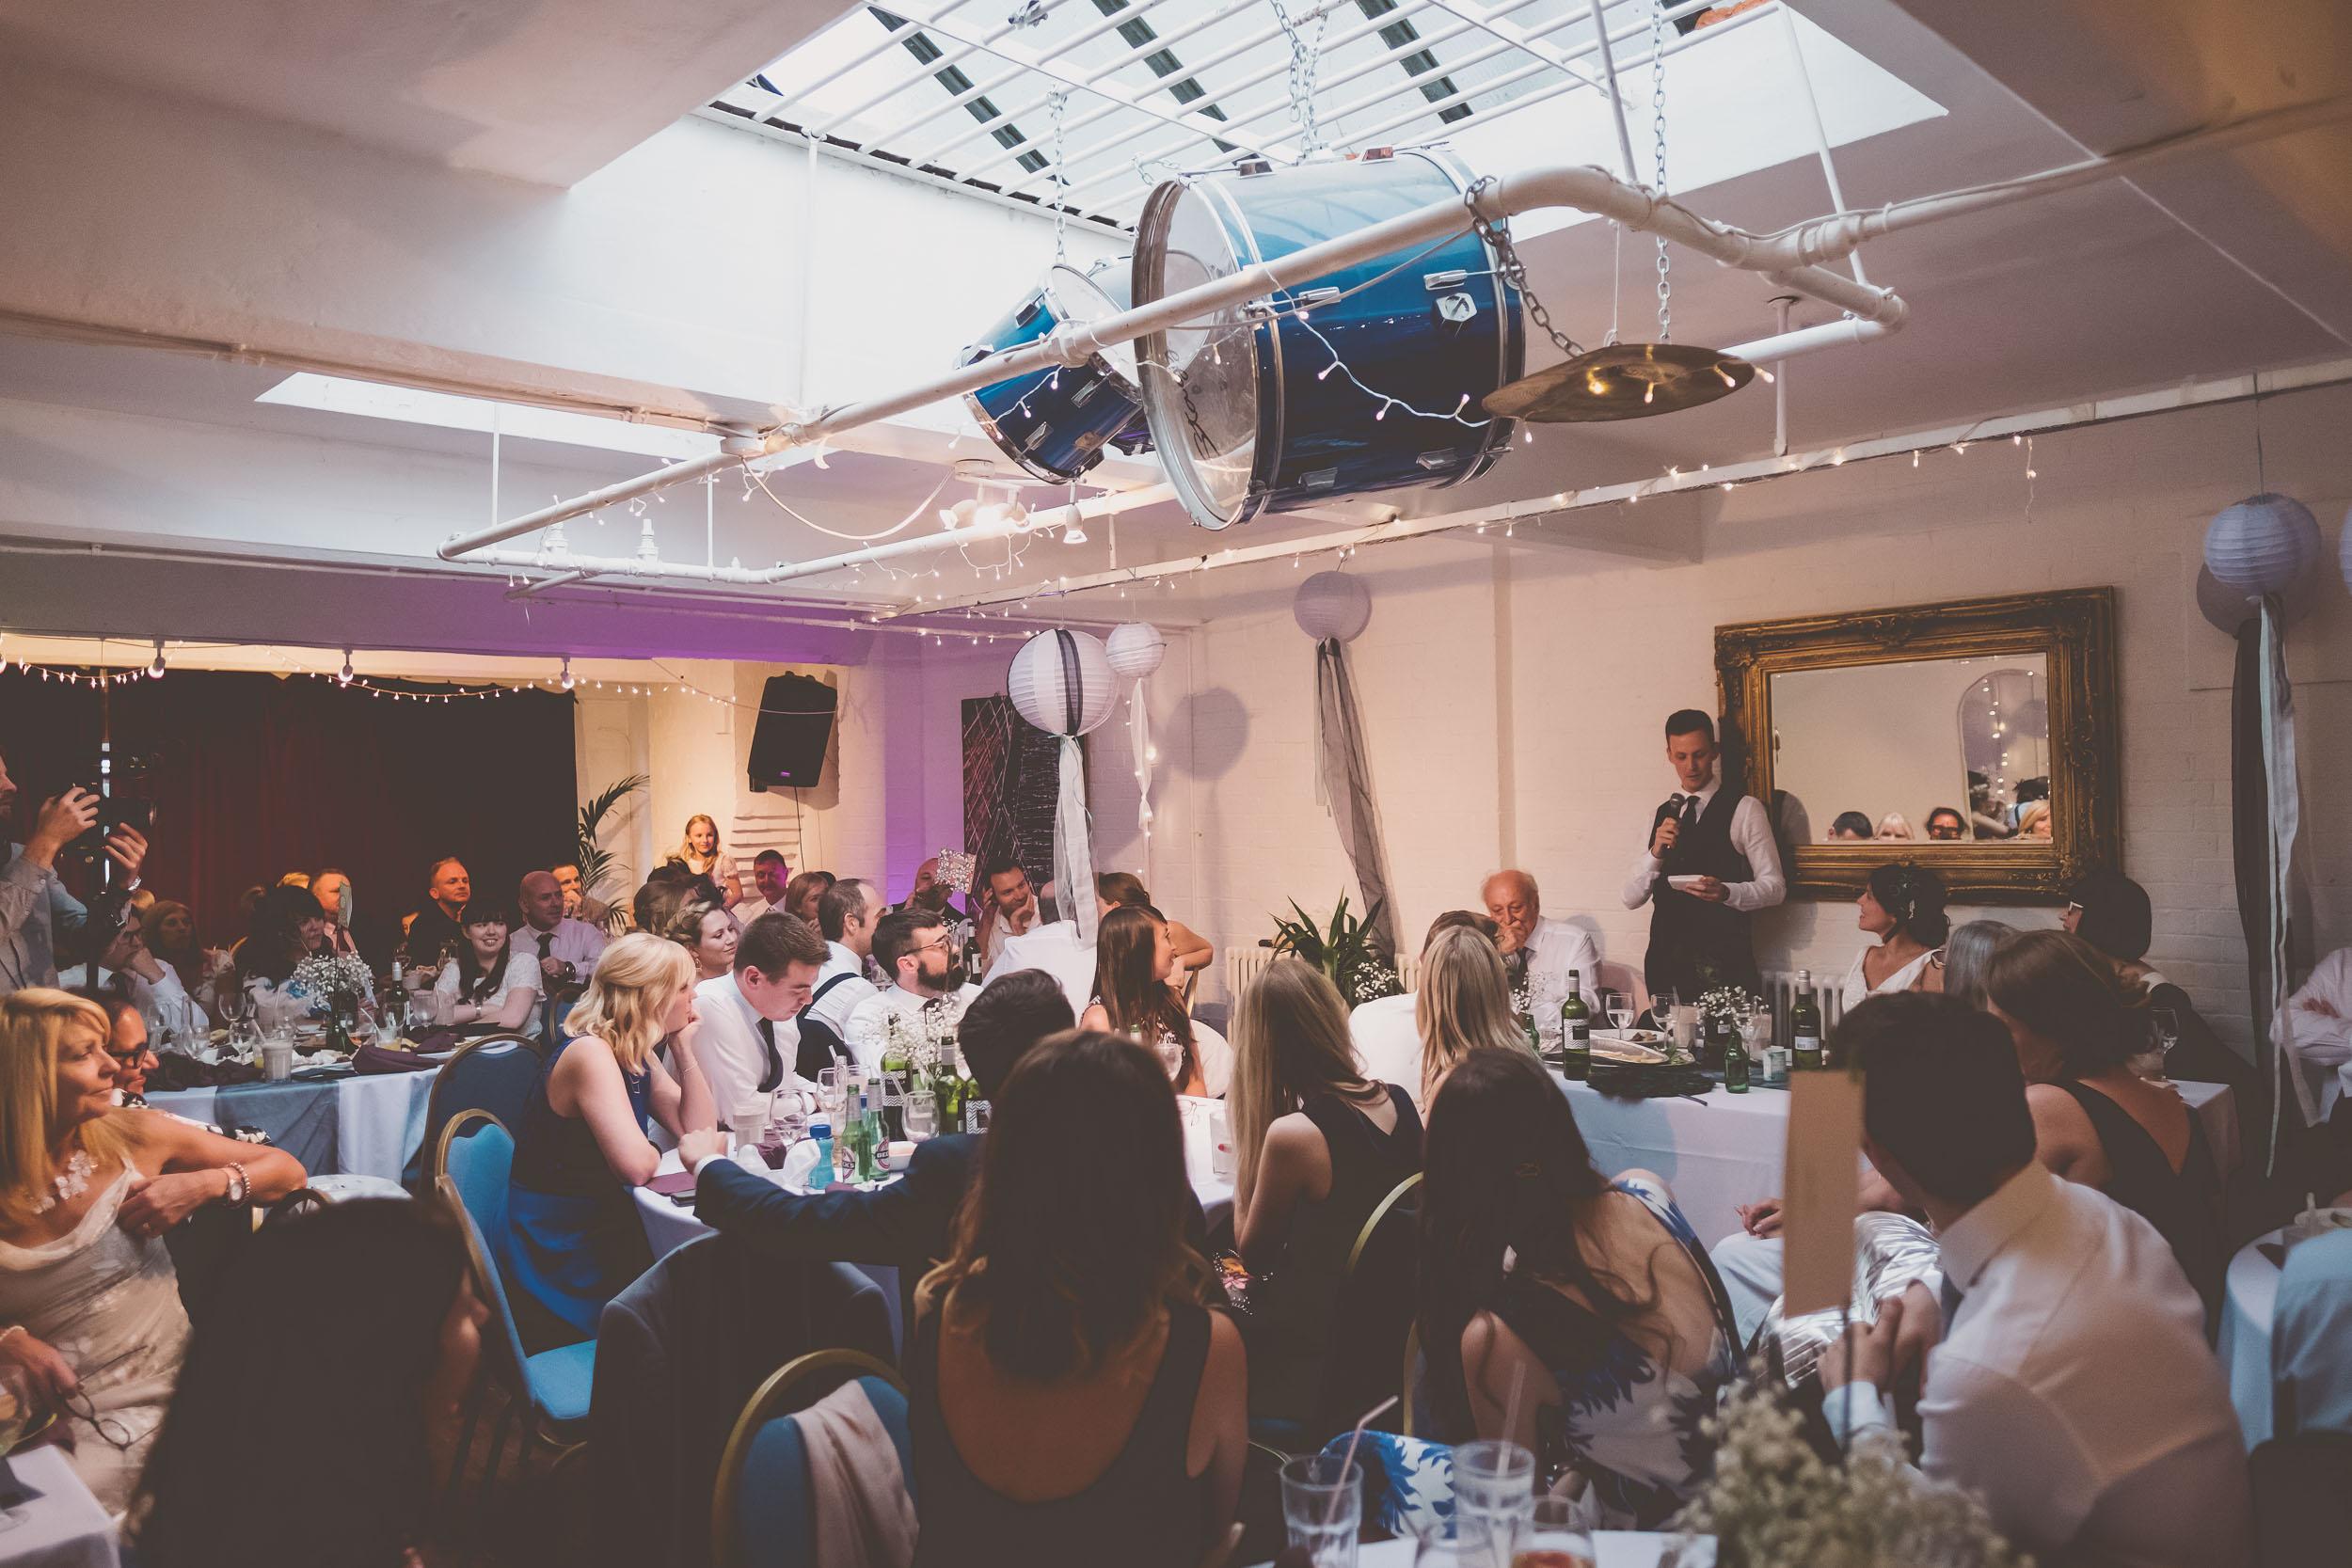 islington-town-hall-4th-floor-studios-wedding372.jpg